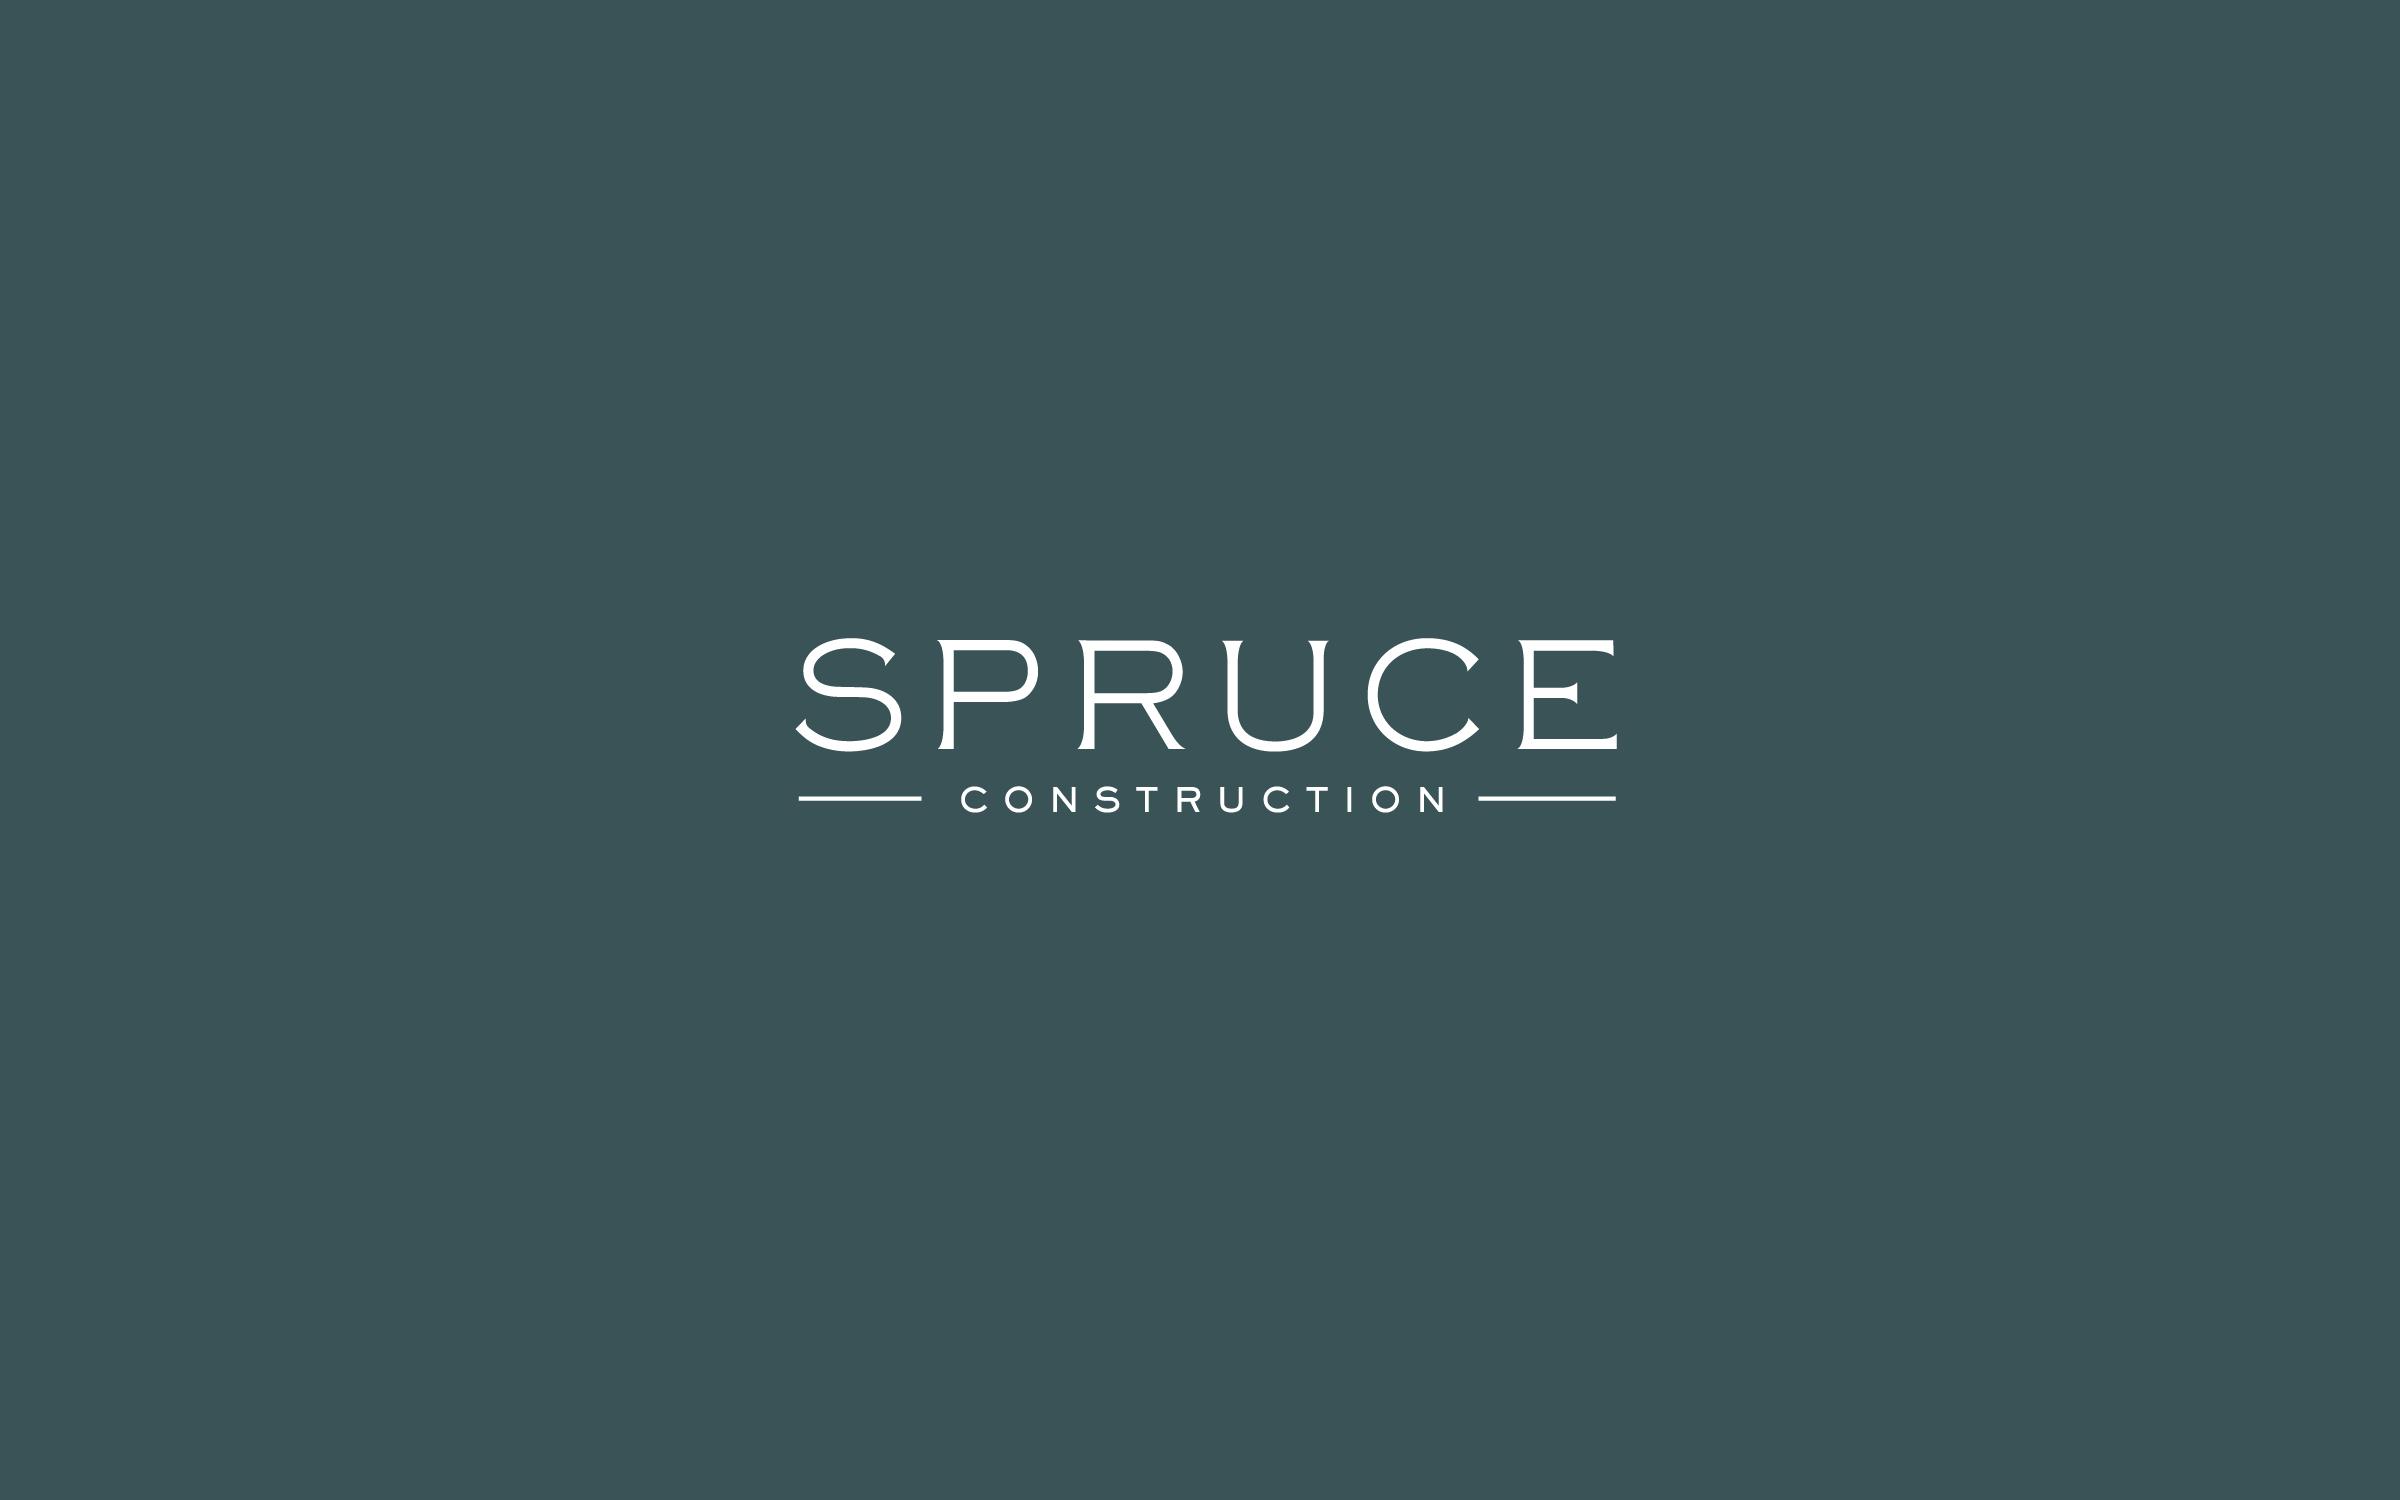 Spruce Construction-30.jpg